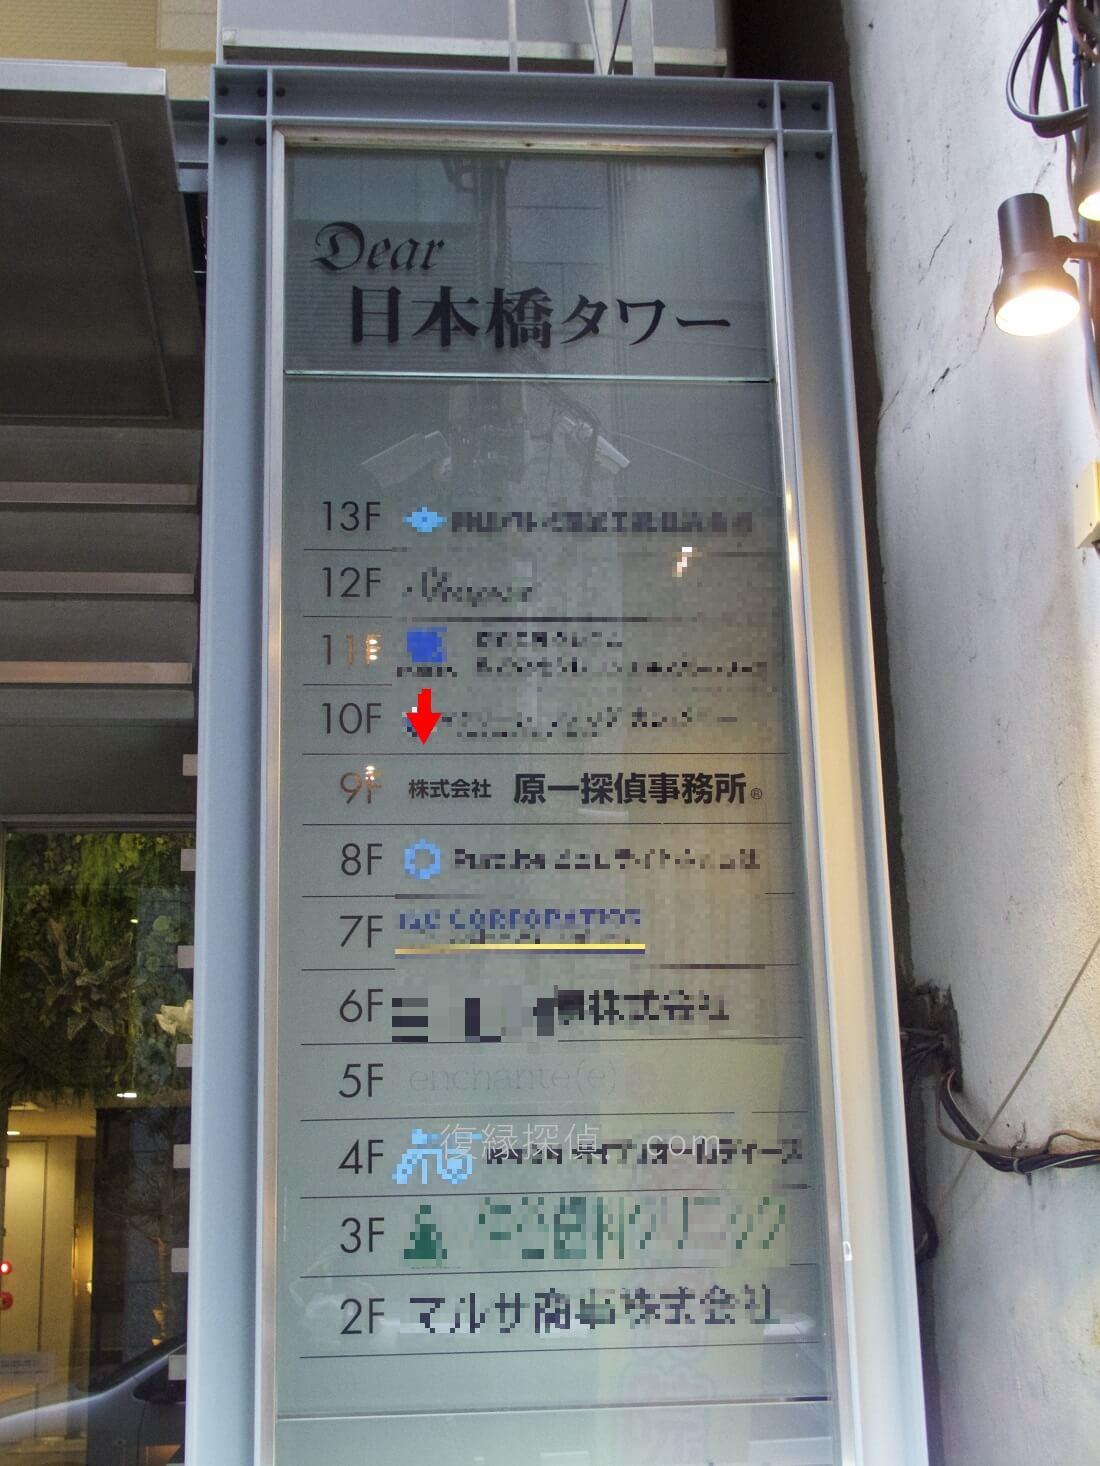 原一探偵事務所の日本橋・東京本社の口コミ・評判